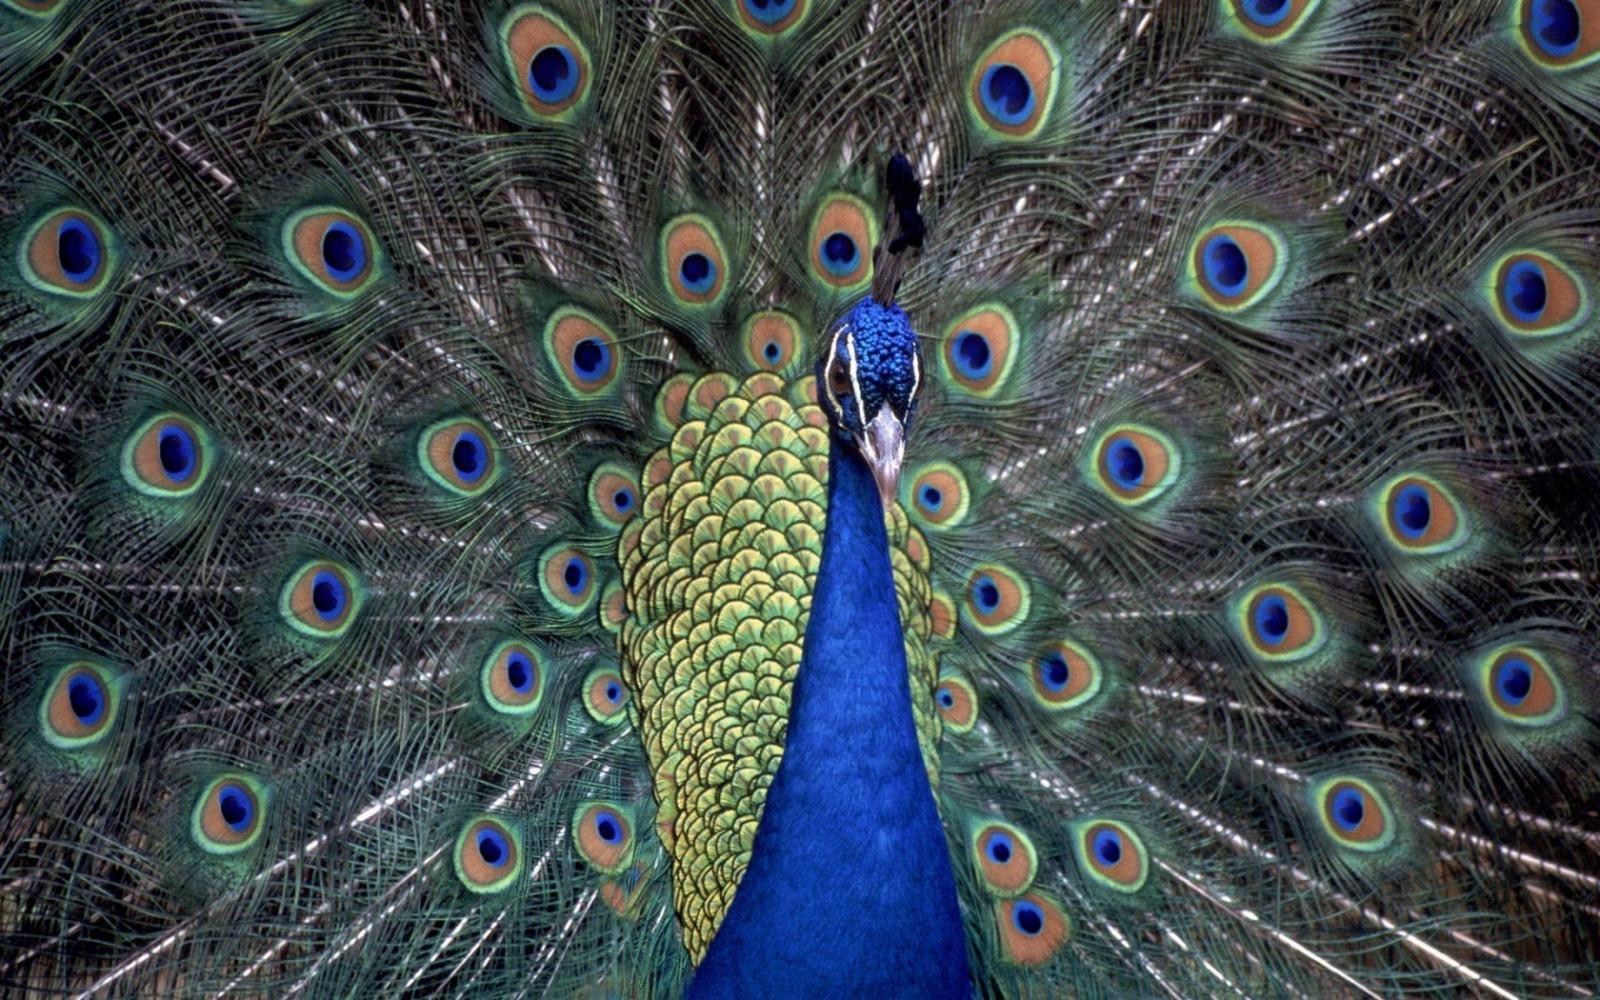 98  Gambar Burung Merak Hd HD Paling Bagus